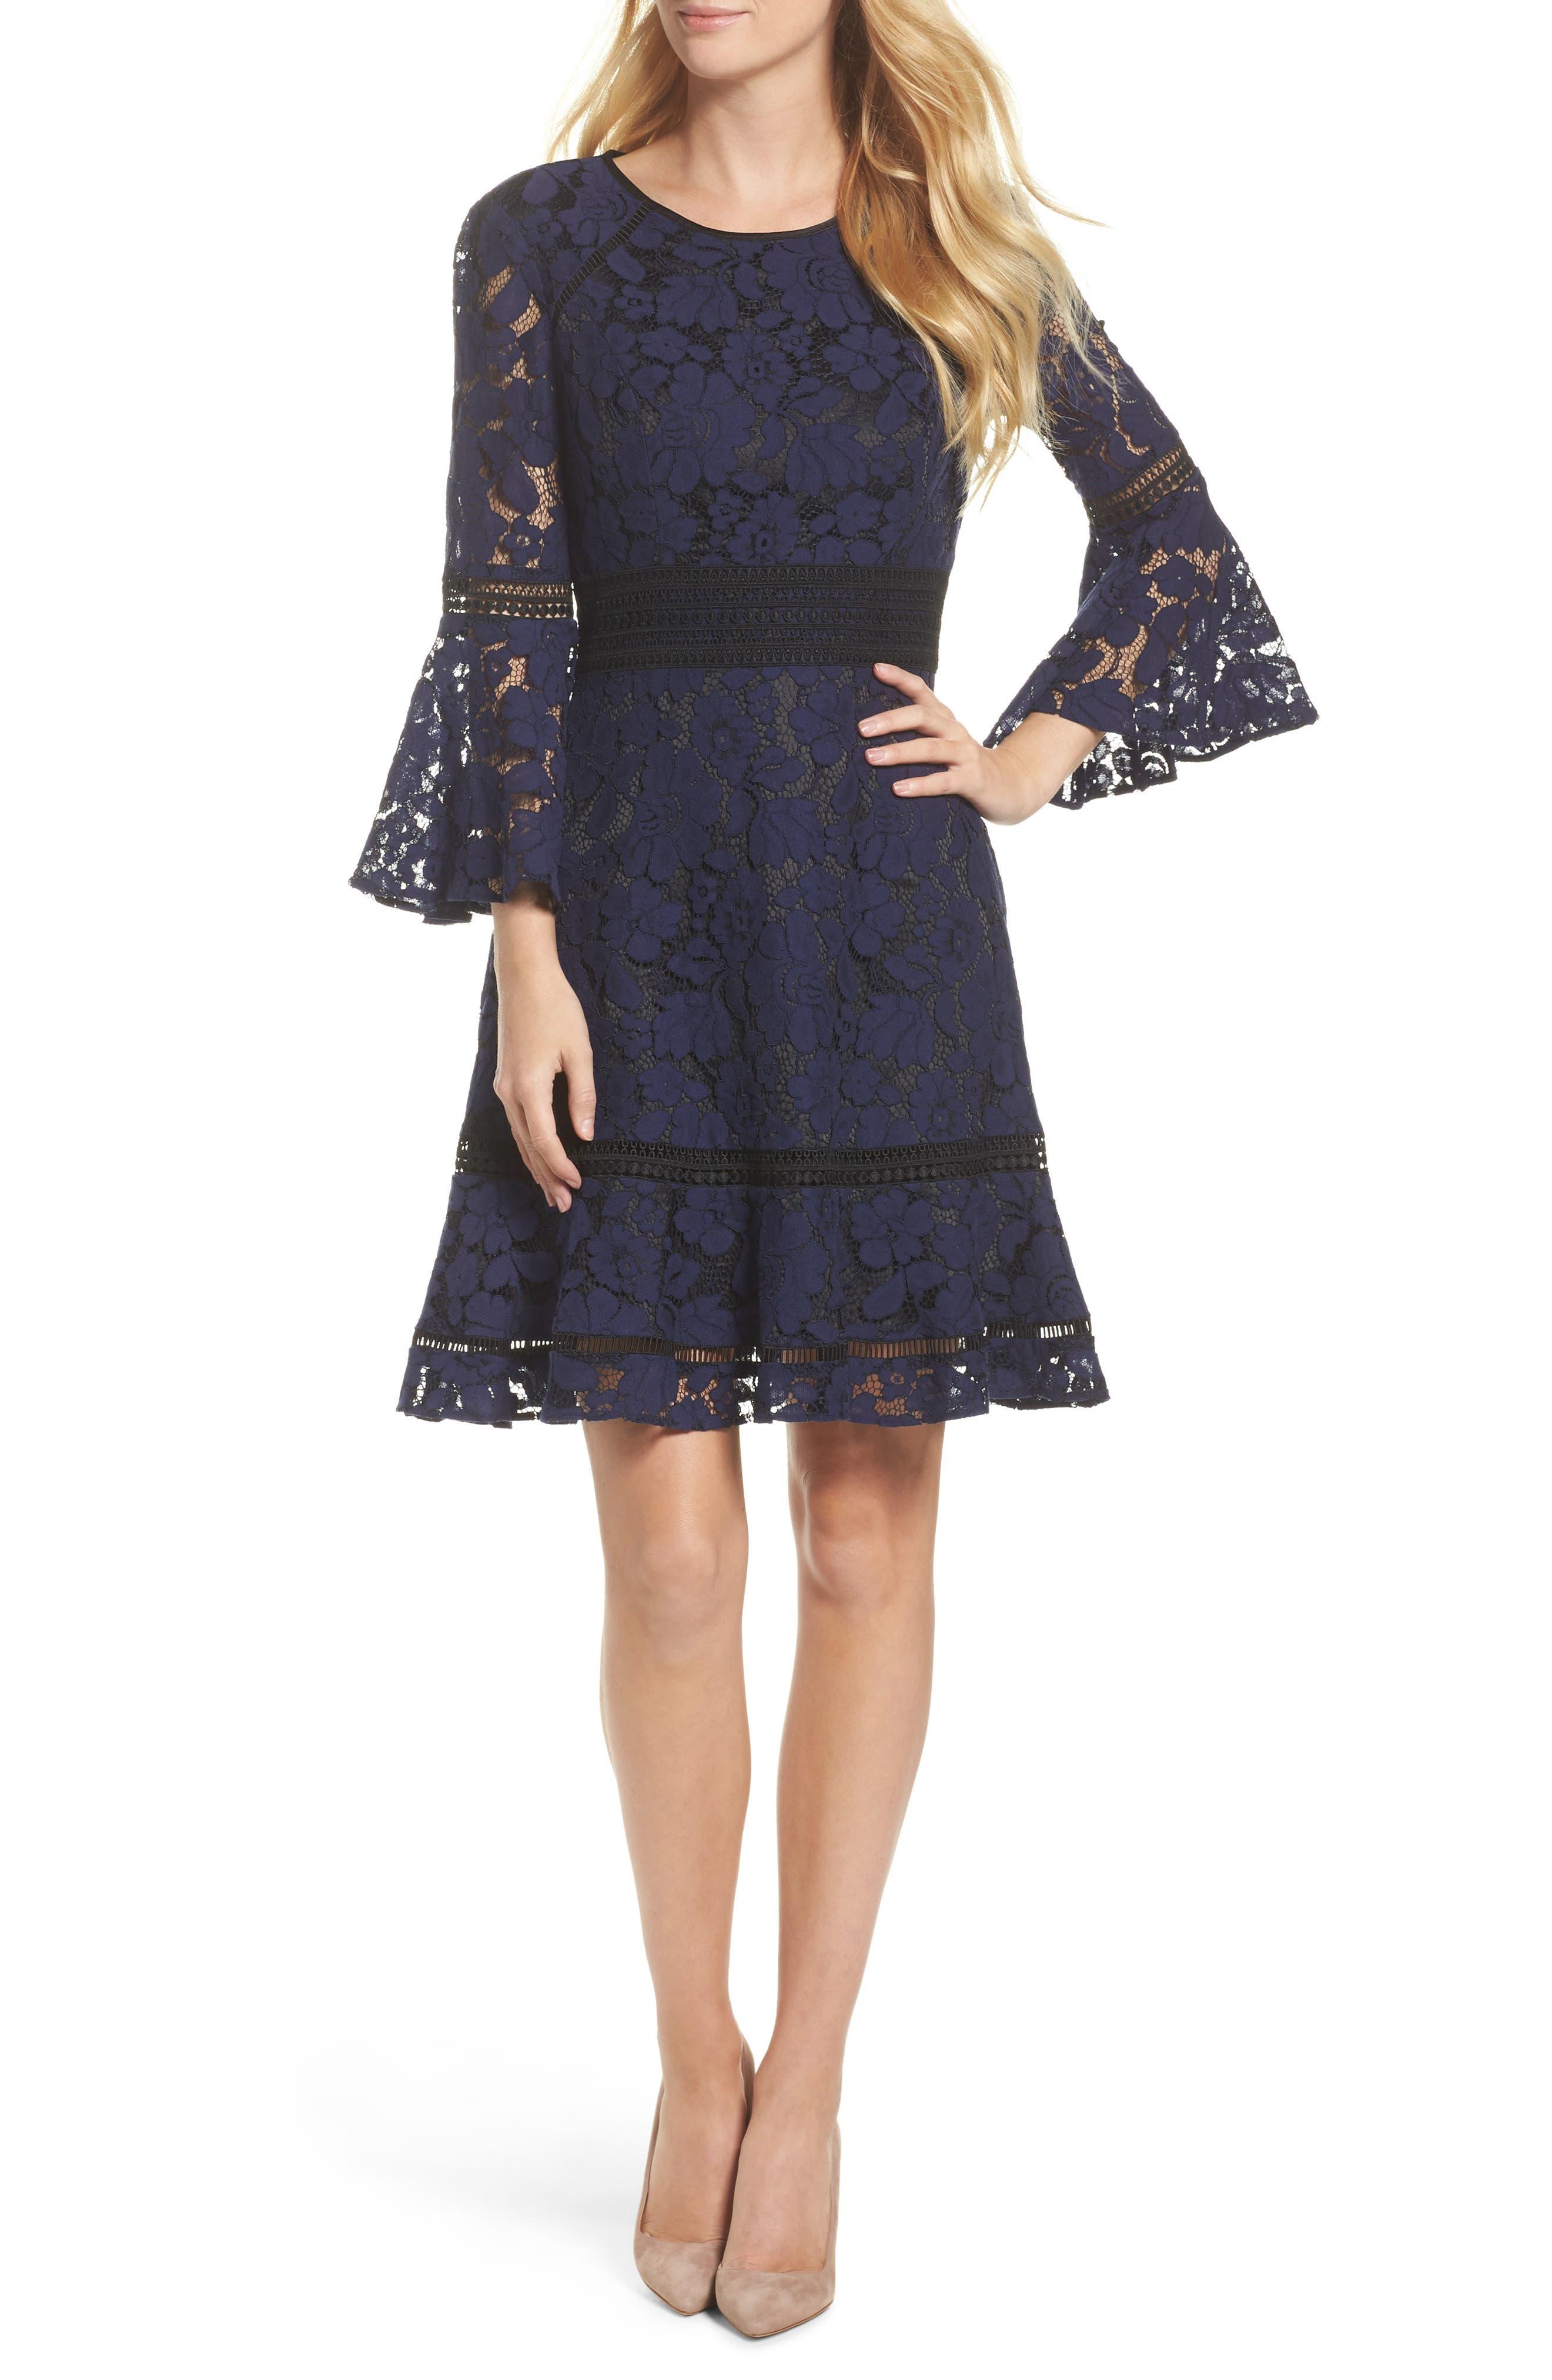 Black aline cocktail dresses